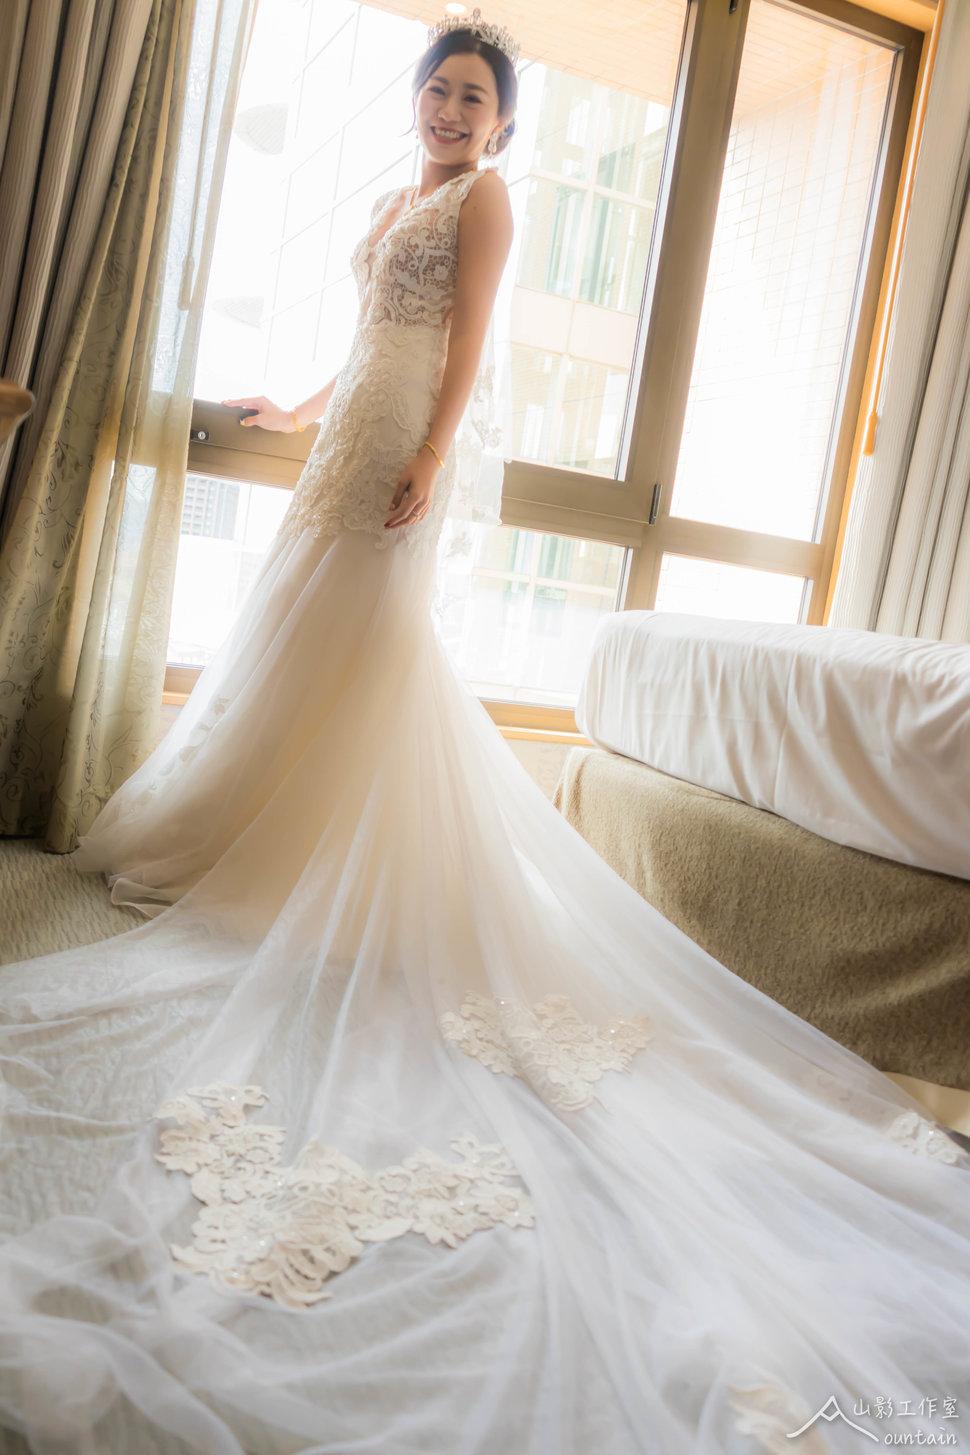 wedding-D167-Mountain studio - 山影工作室 MOUNTAIN《結婚吧》